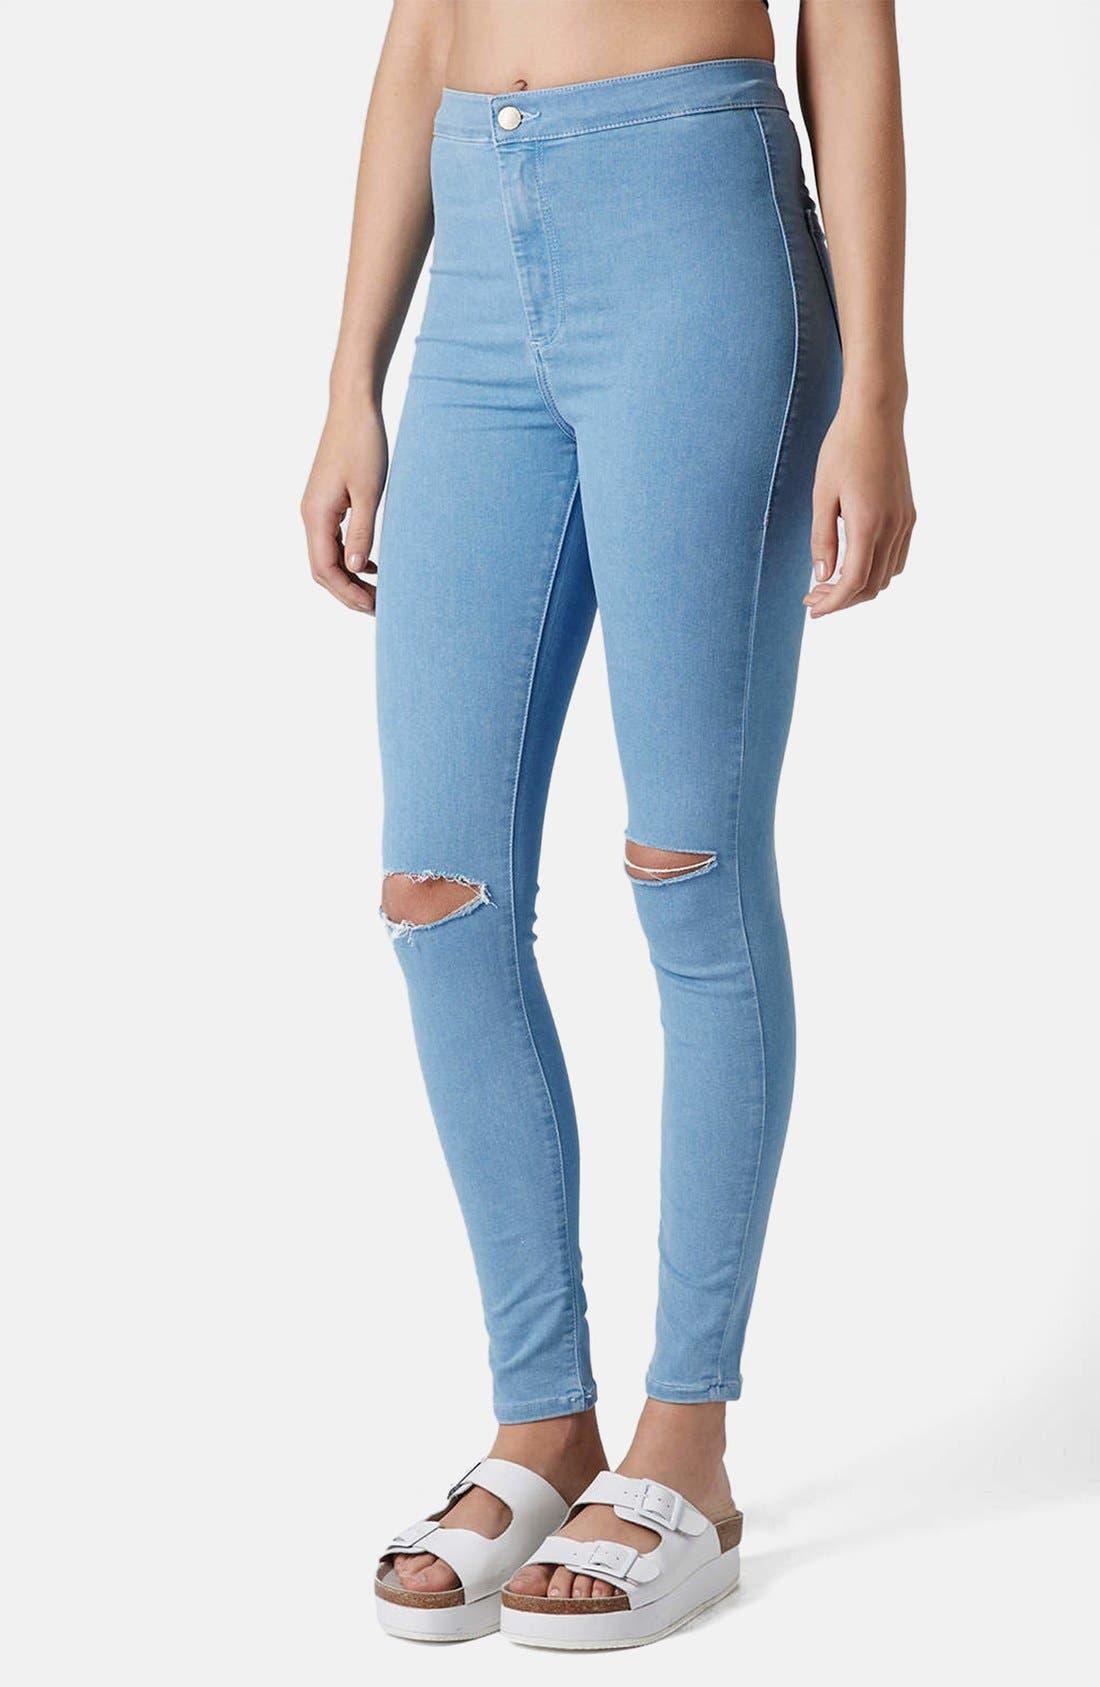 Alternate Image 1 Selected - Topshop Moto 'Joni' Ripped High Rise Skinny Jeans (Light Denim) (Short)